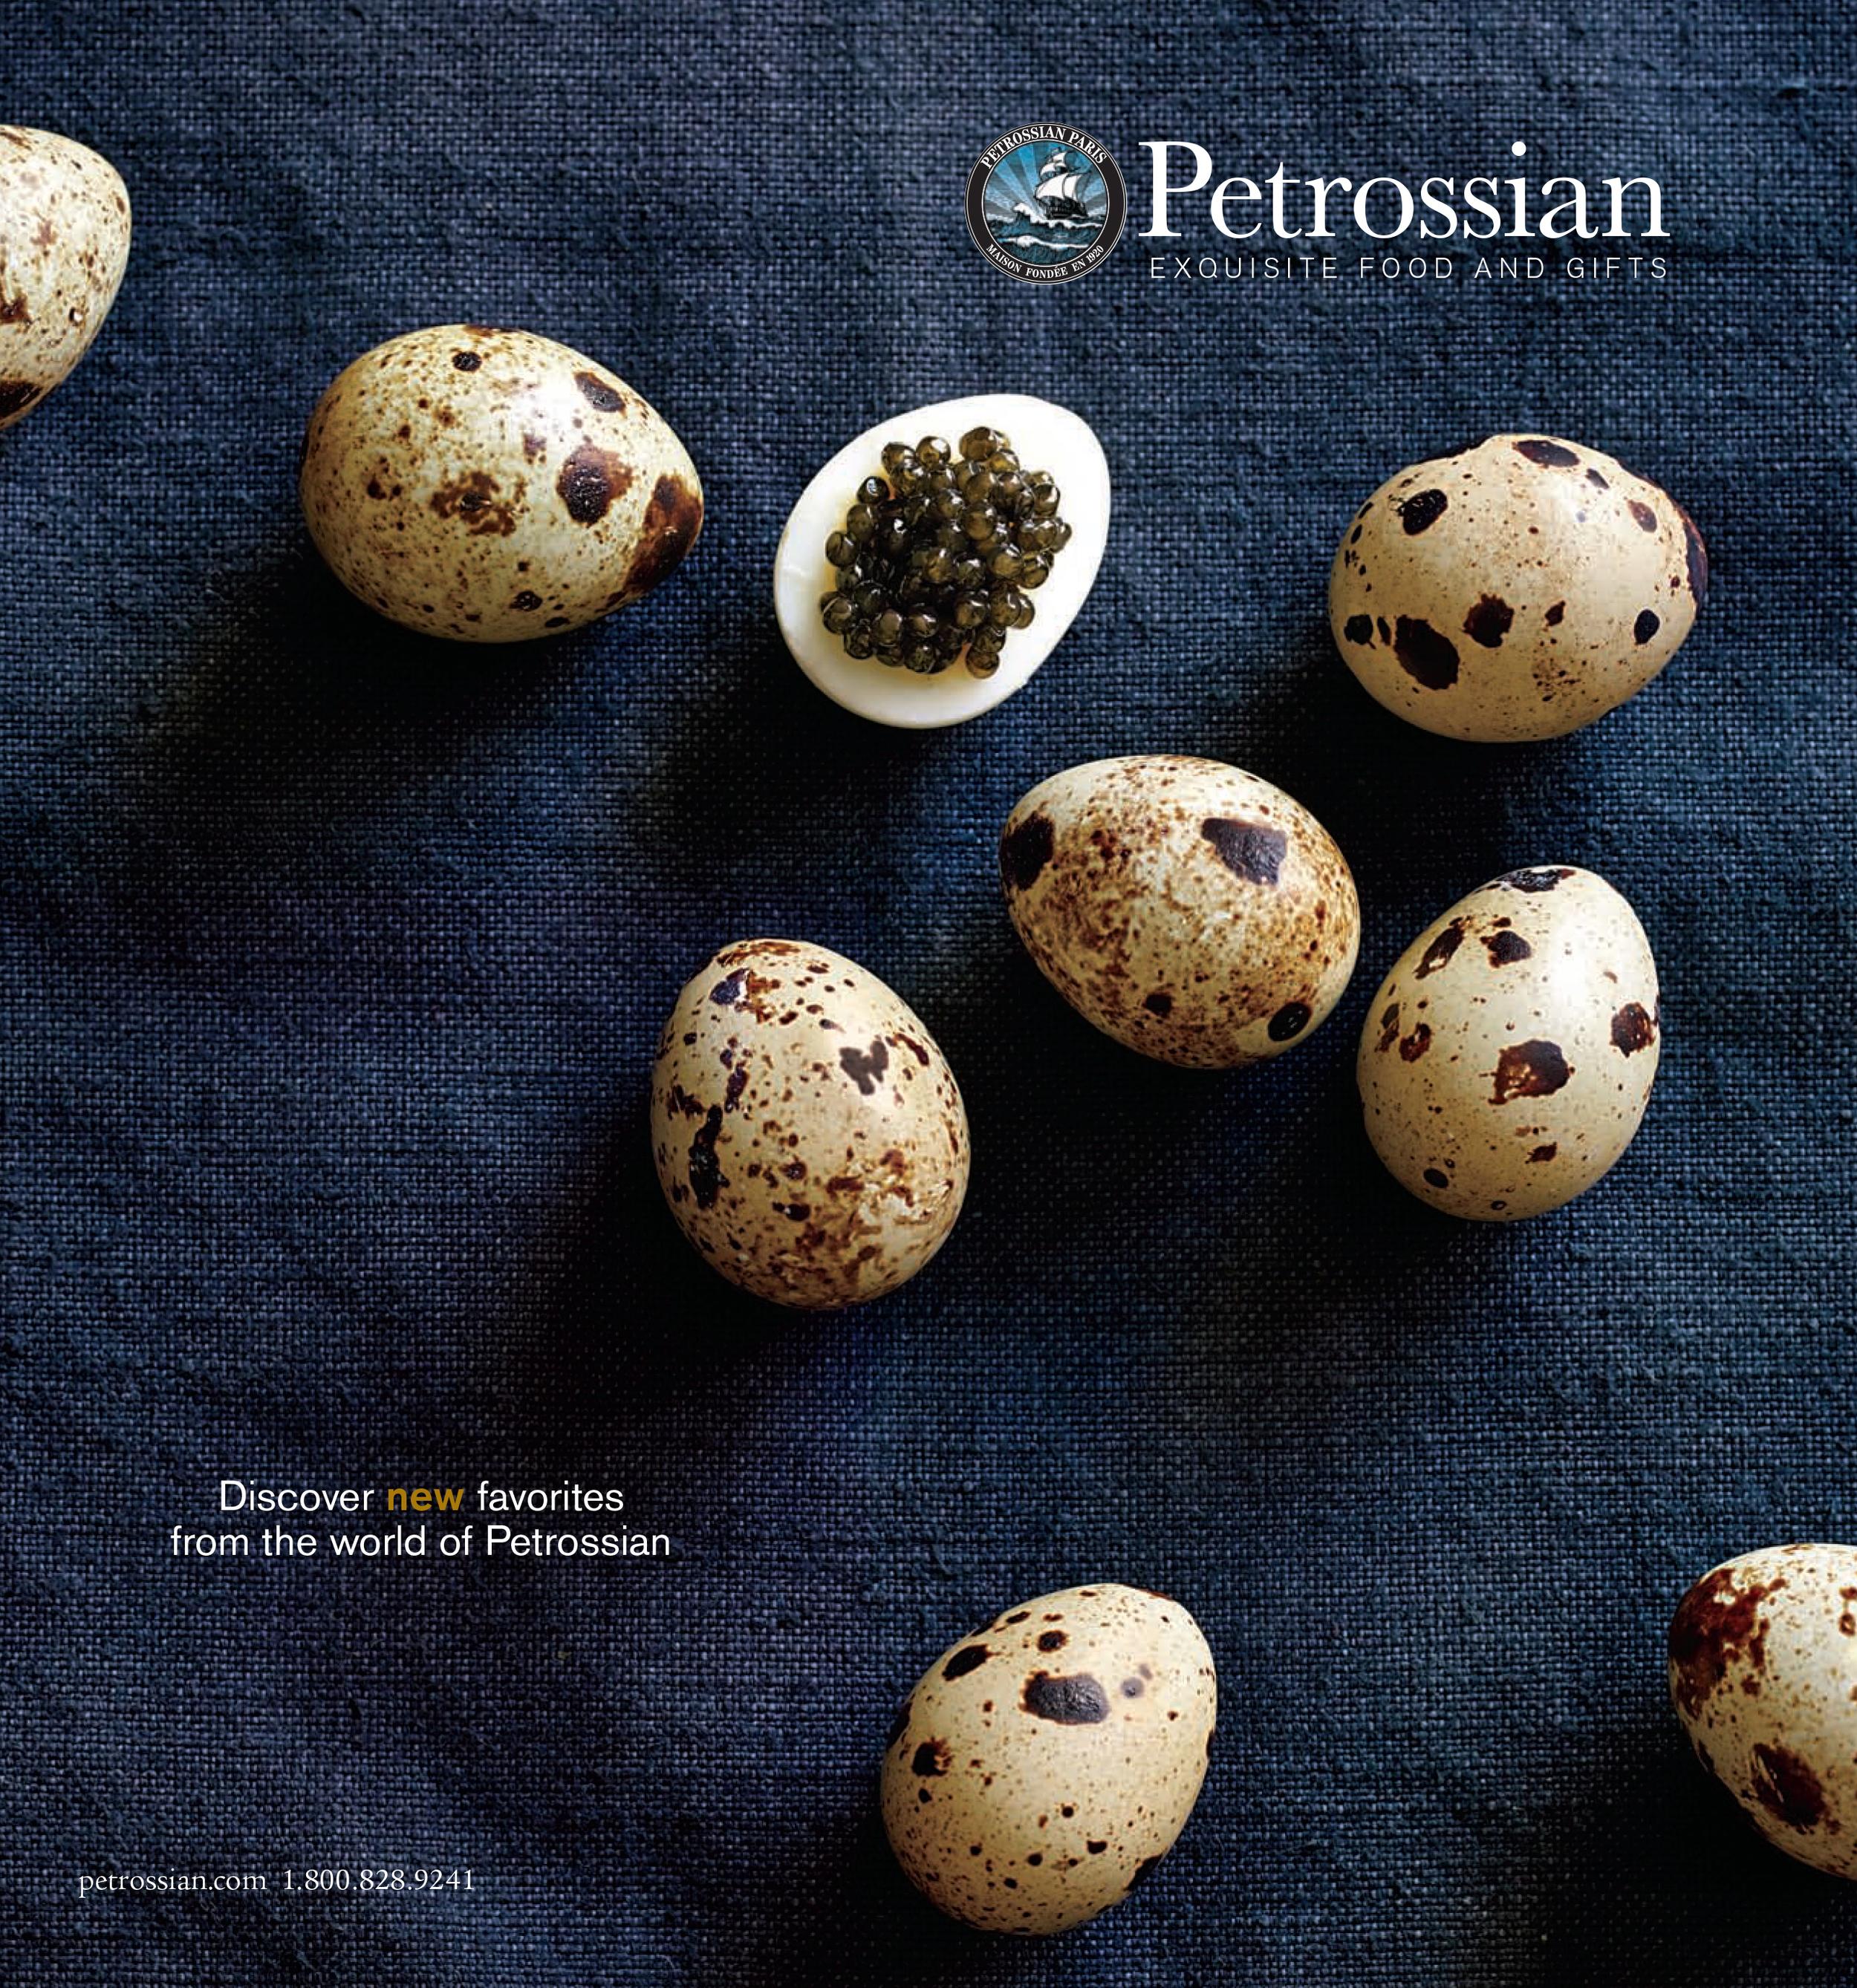 Petrossian_2013FINALBLUES_3.jpg